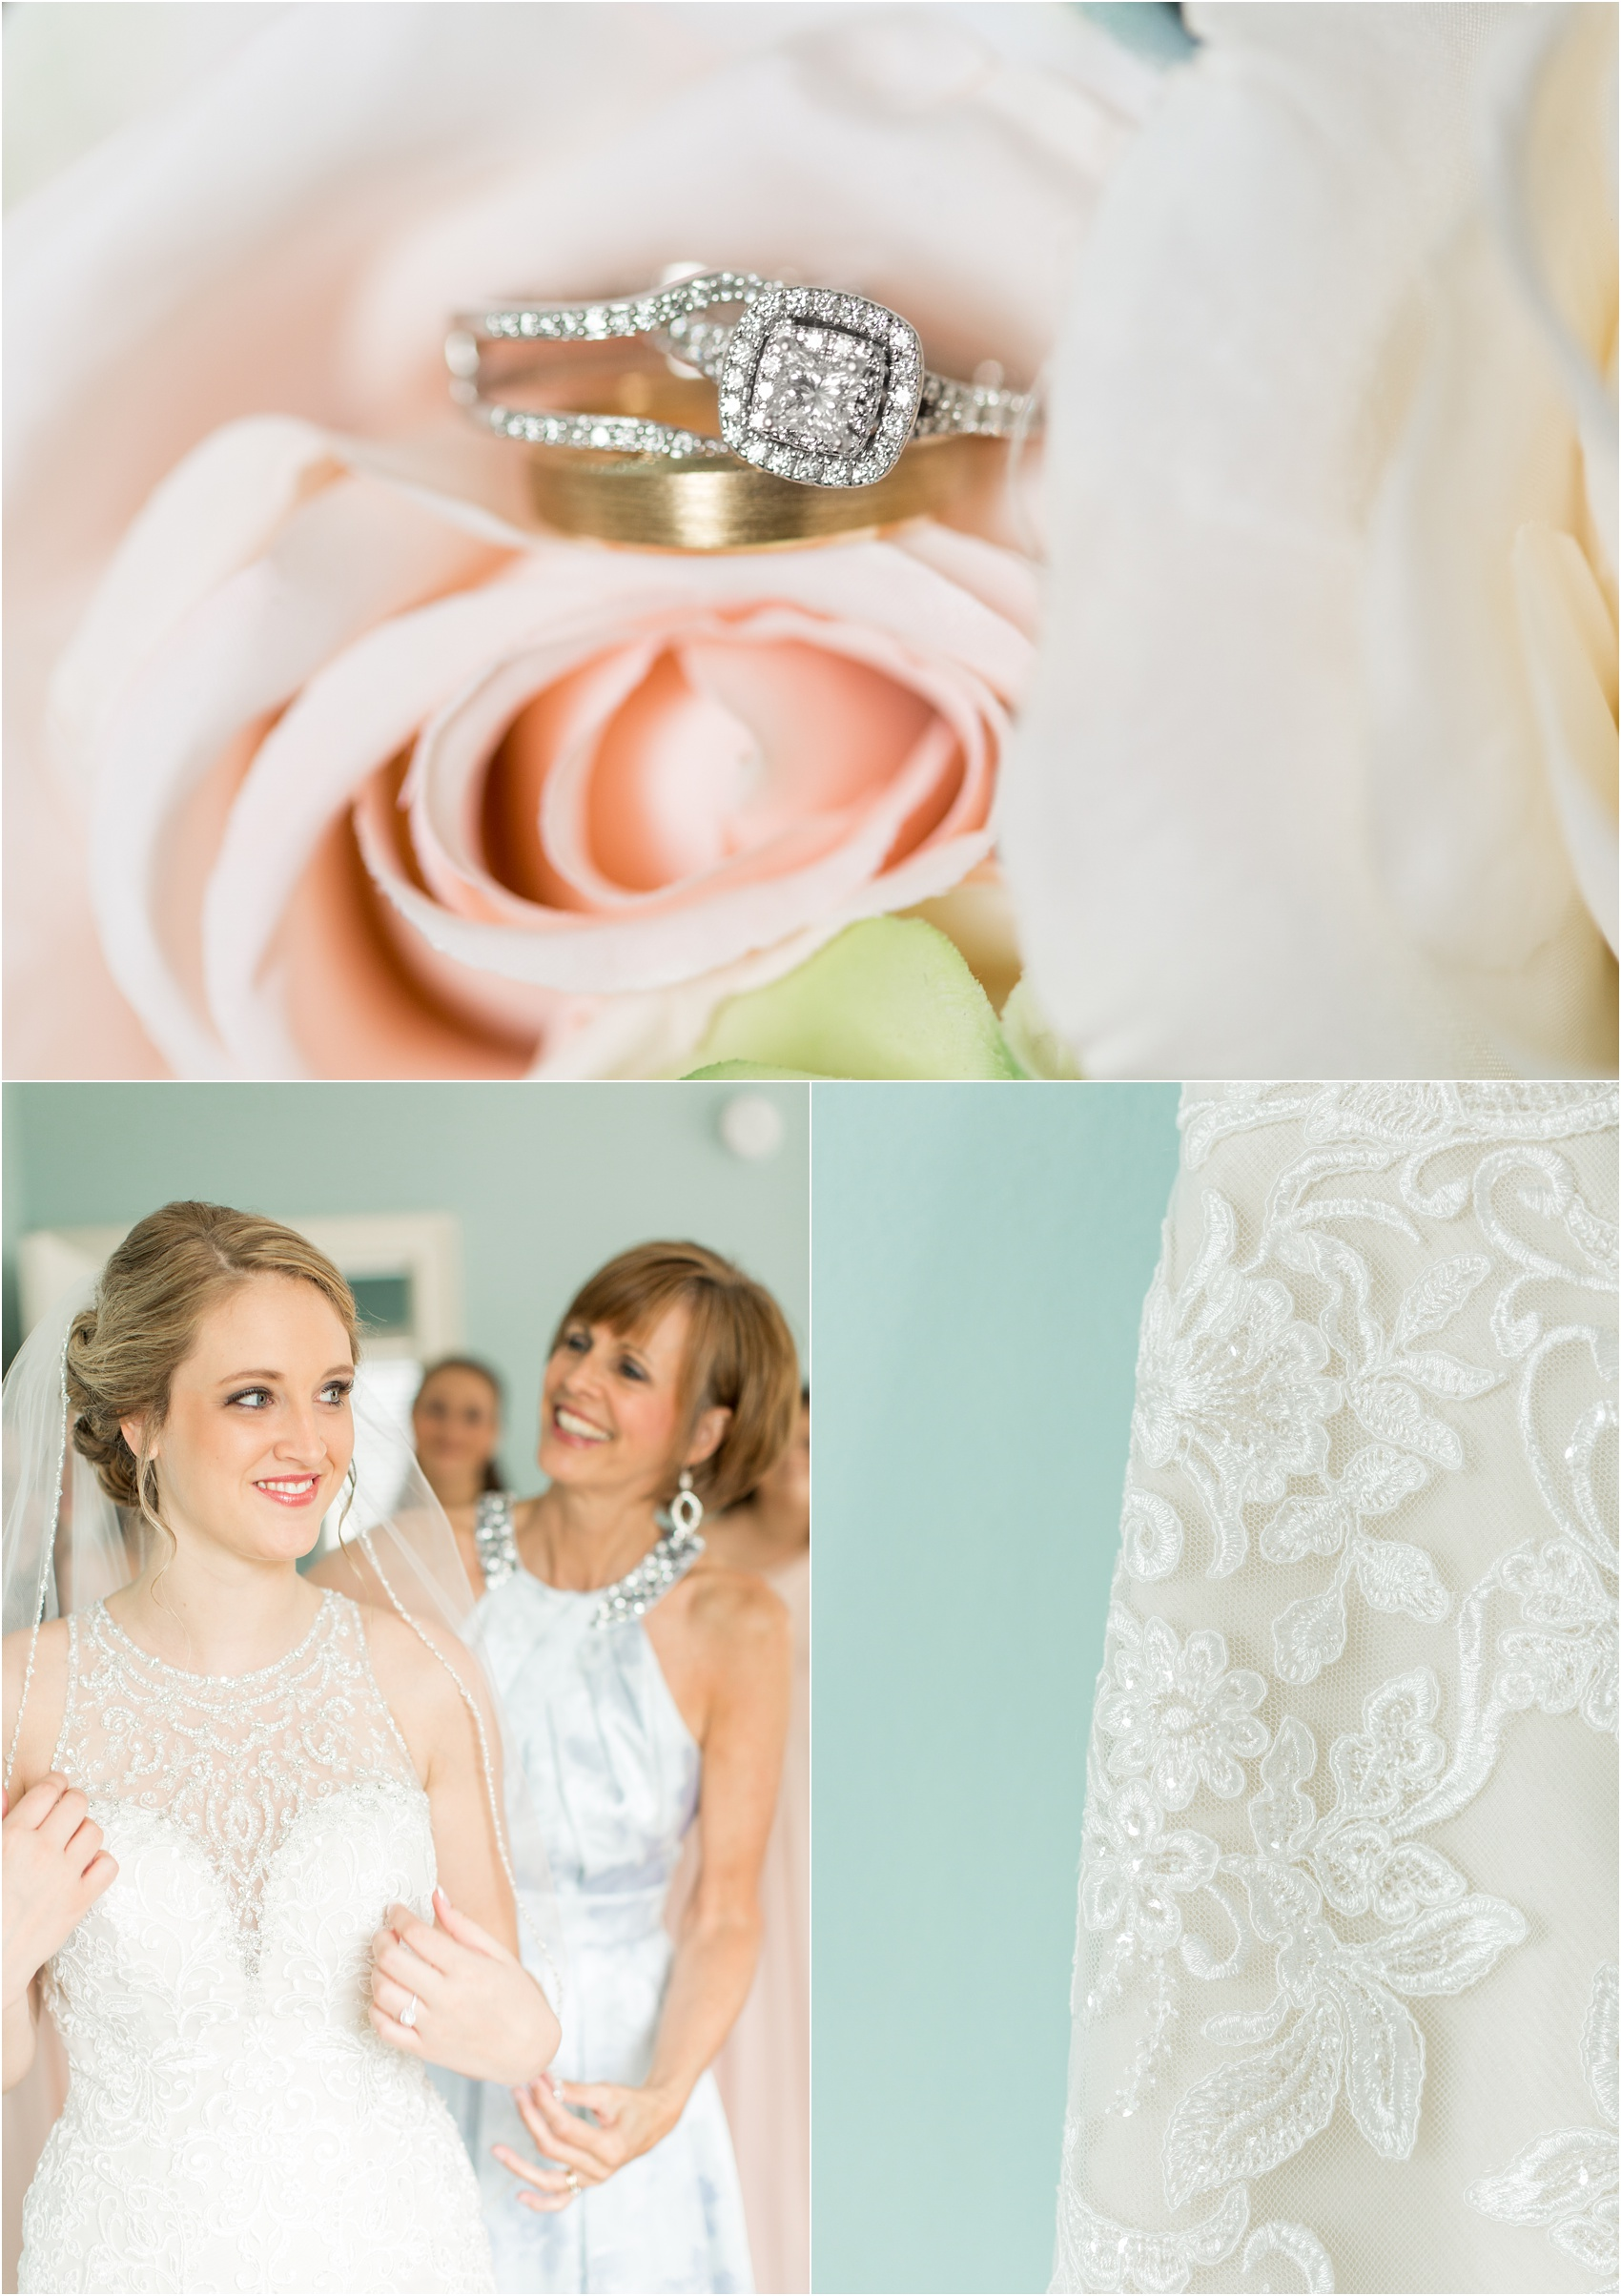 Savannah Eve Photography- Roper-Powell Wedding- Blog-4.jpg